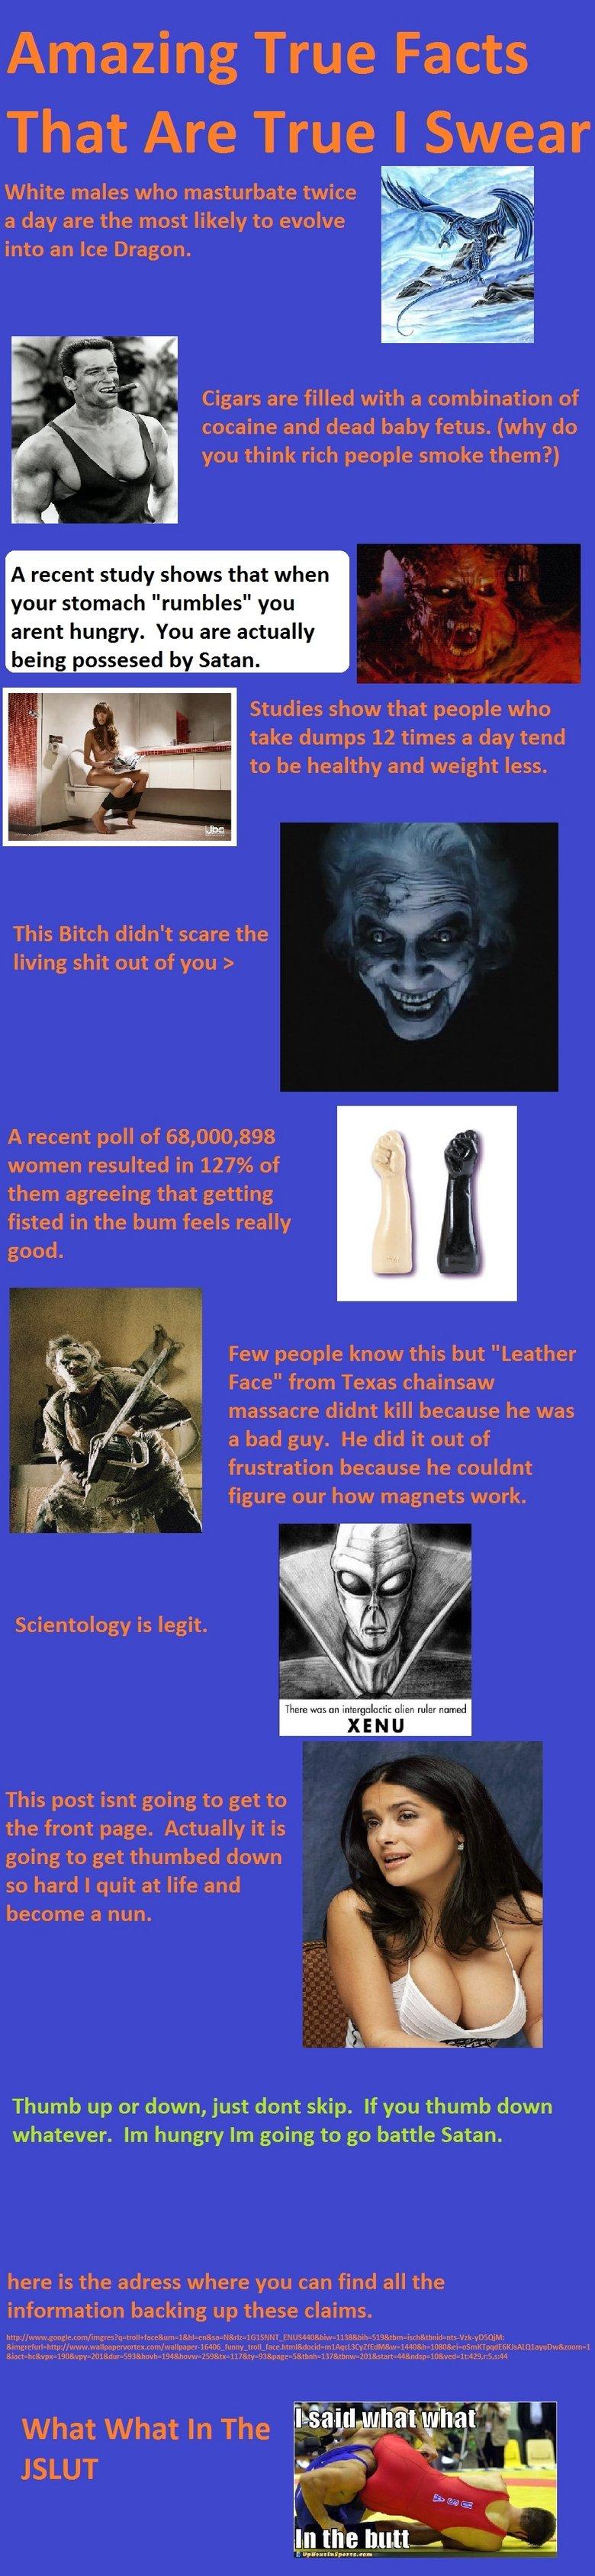 Amazing True Facts Comp 1. part 2:funnyjunk.com/funny_pictures/2691901/Amazing+True+Facts+Comp+2/ Part 3: funnyjunk.com/funny_pictures/2693945/Amazing+True+Fact facts funny True amazing facts